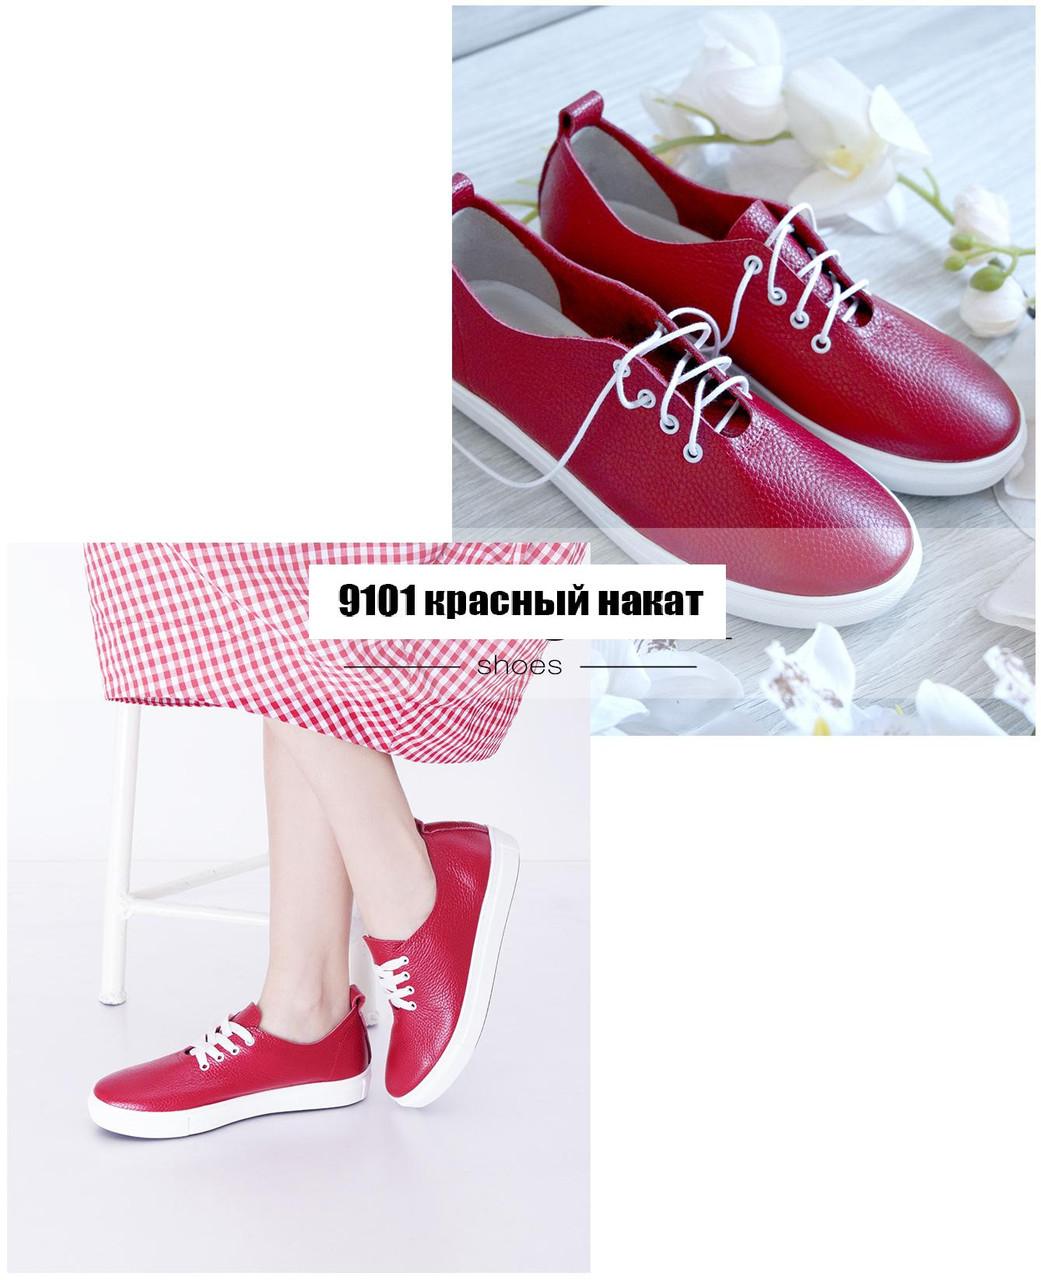 Туфли женские юр9101